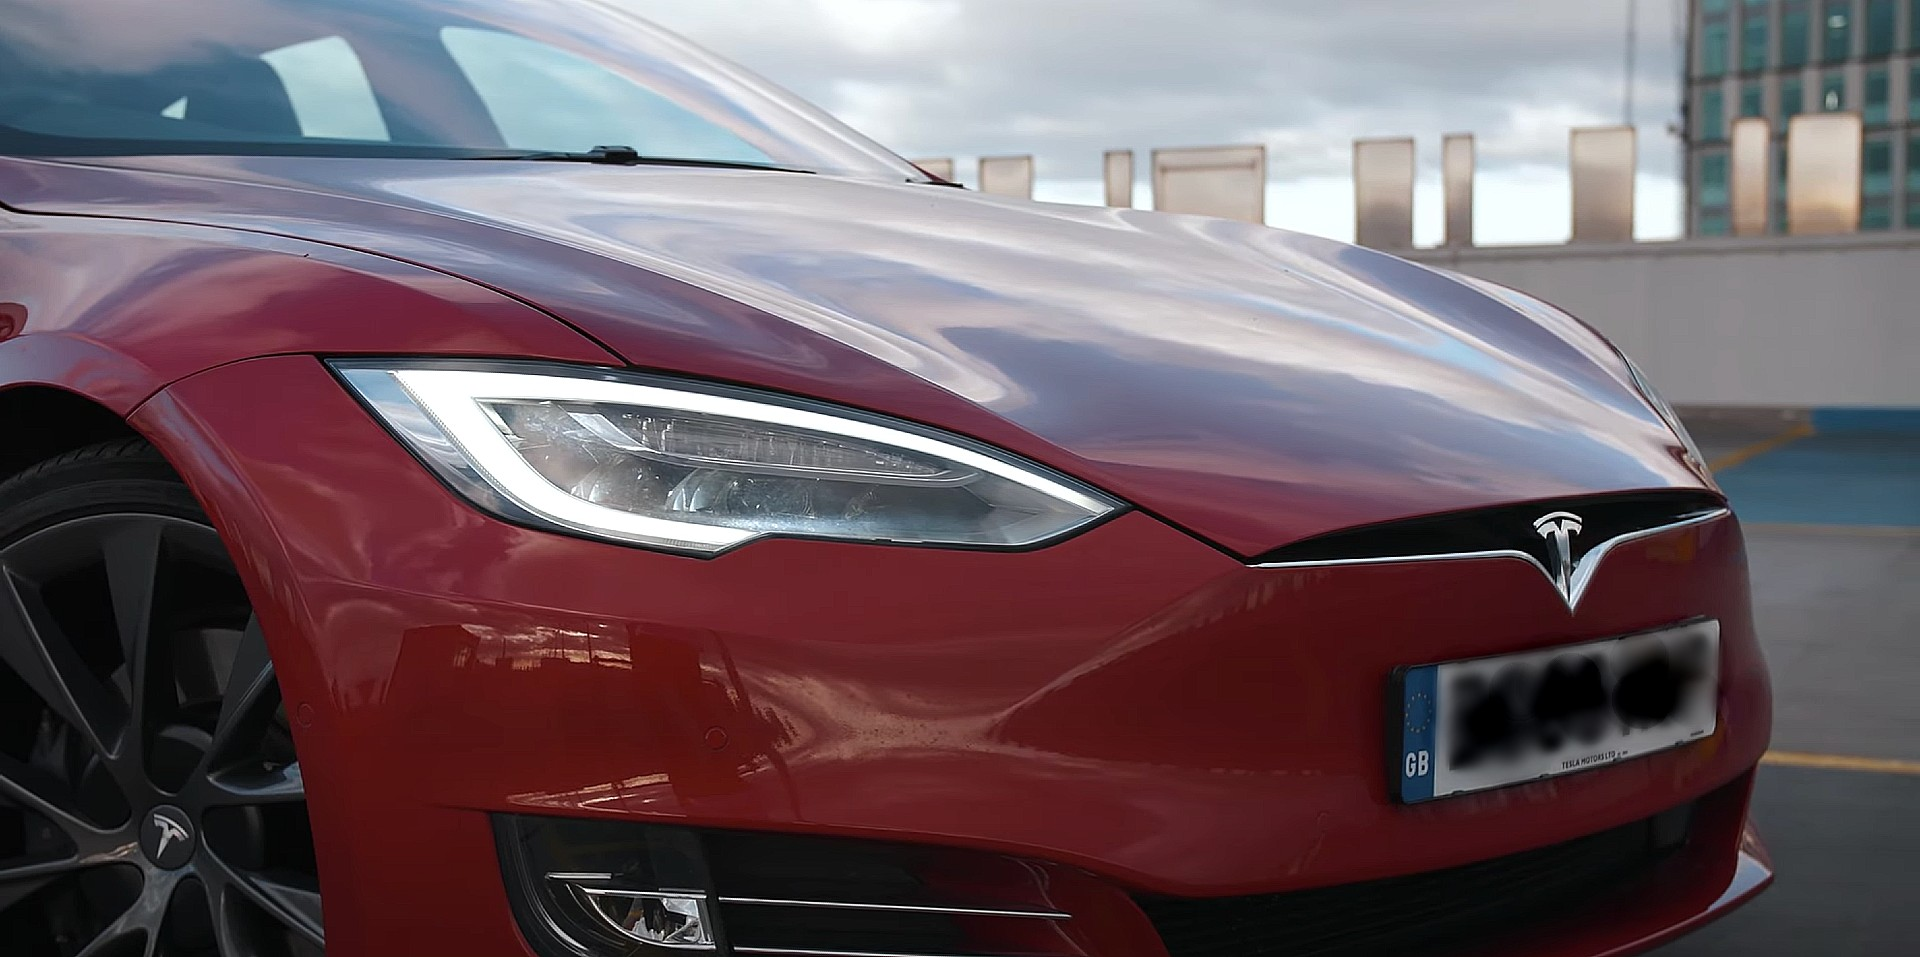 Tesla (TSLA) analysts are adjusting price targets based on